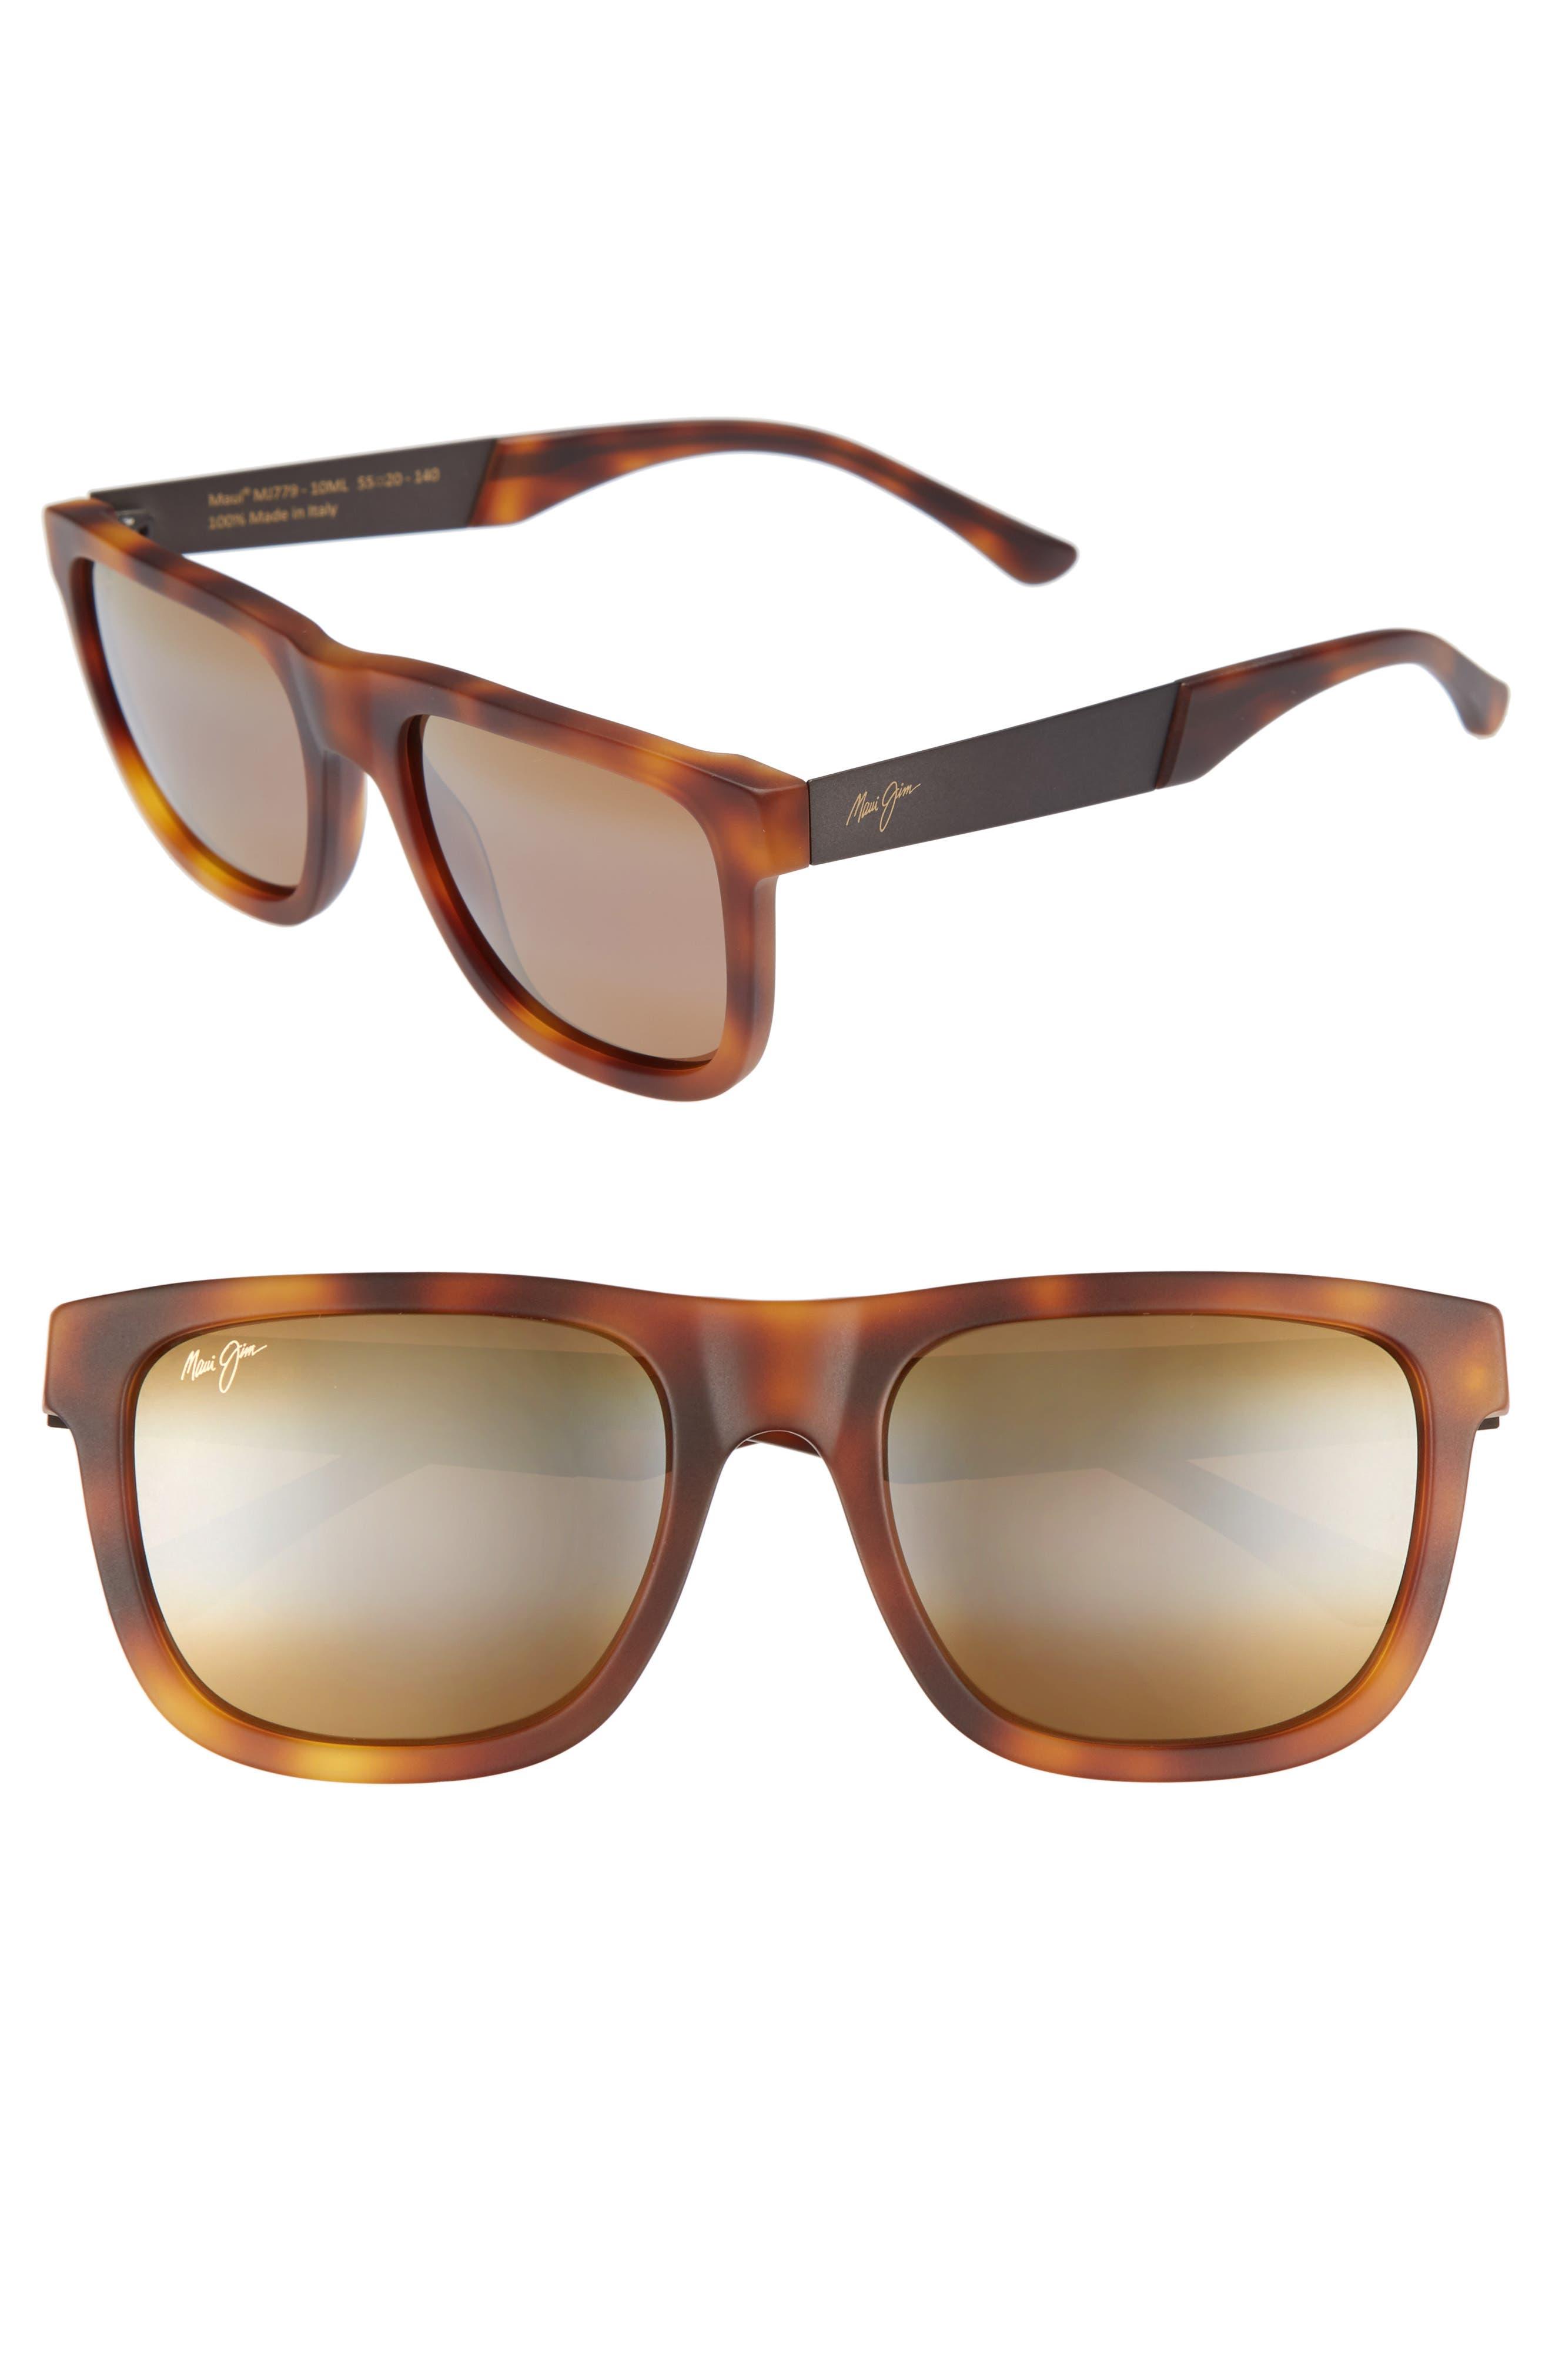 Talk Story 55mm Polarized Sunglasses,                             Main thumbnail 1, color,                             Matte Tokyo Tortoise/ Bronze